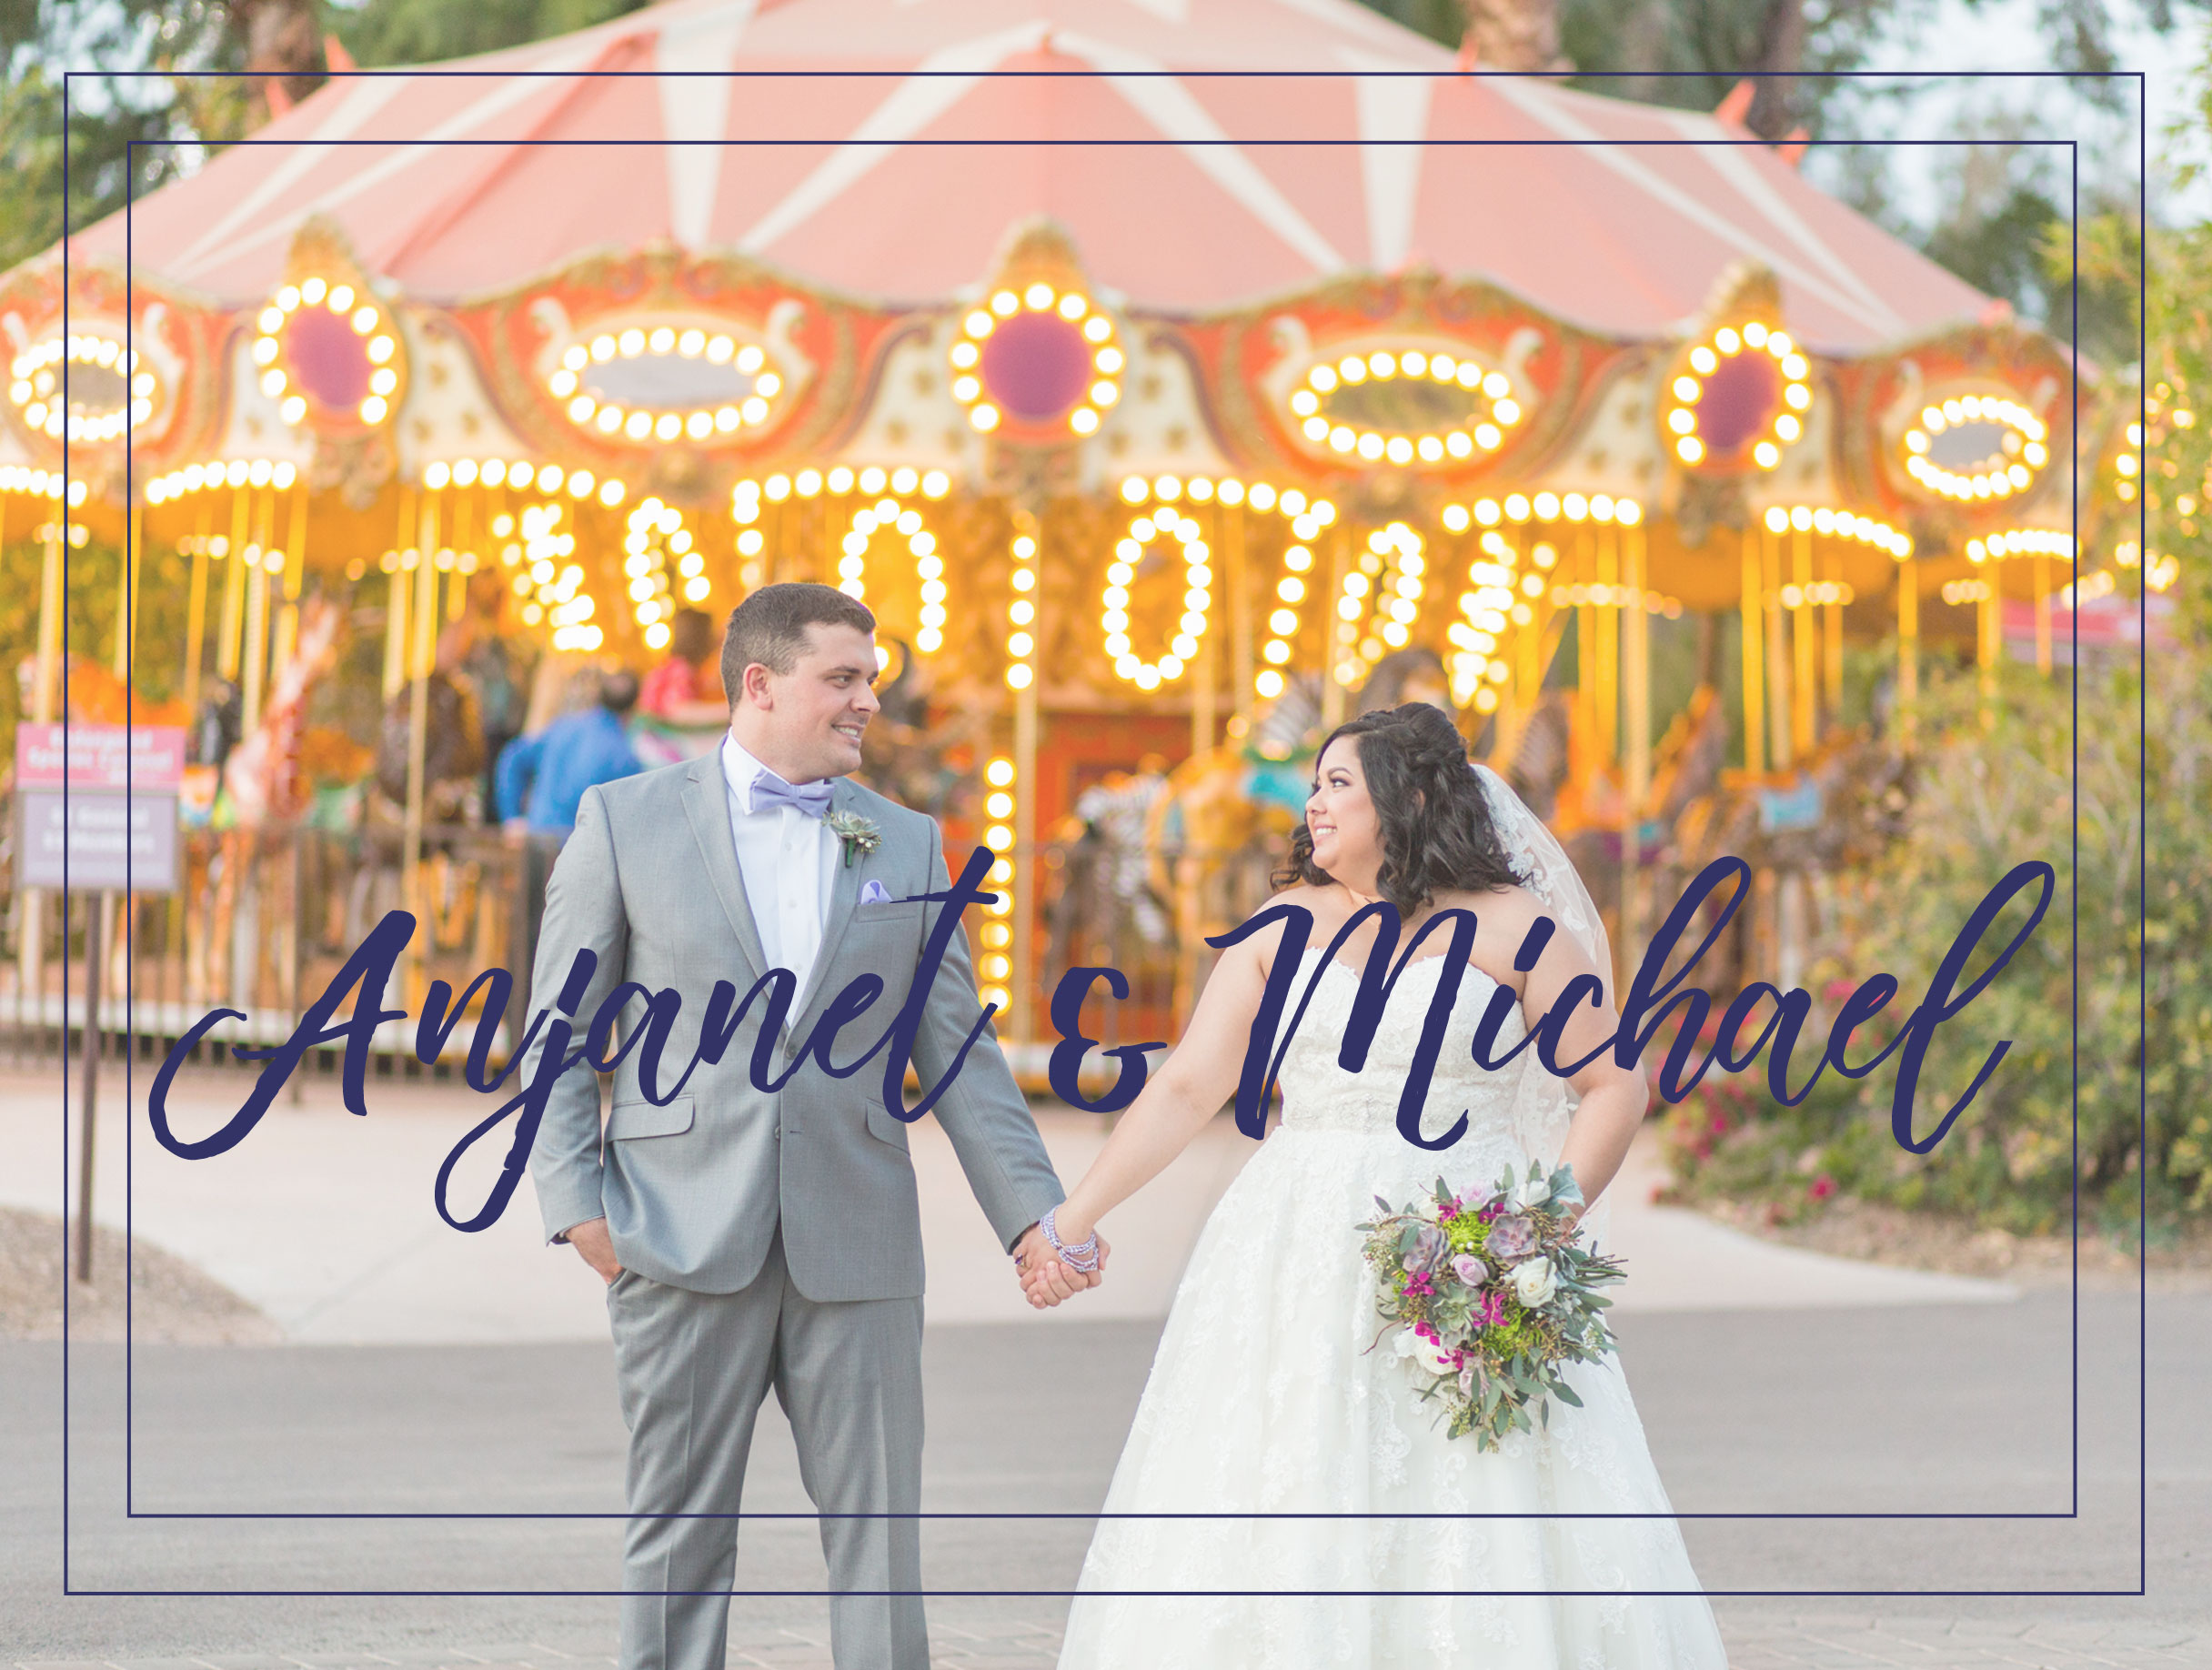 Teresa-Valenica-Photography-Phoenix-Zoo-Wedding-Anjanet-And-Michael.jpg